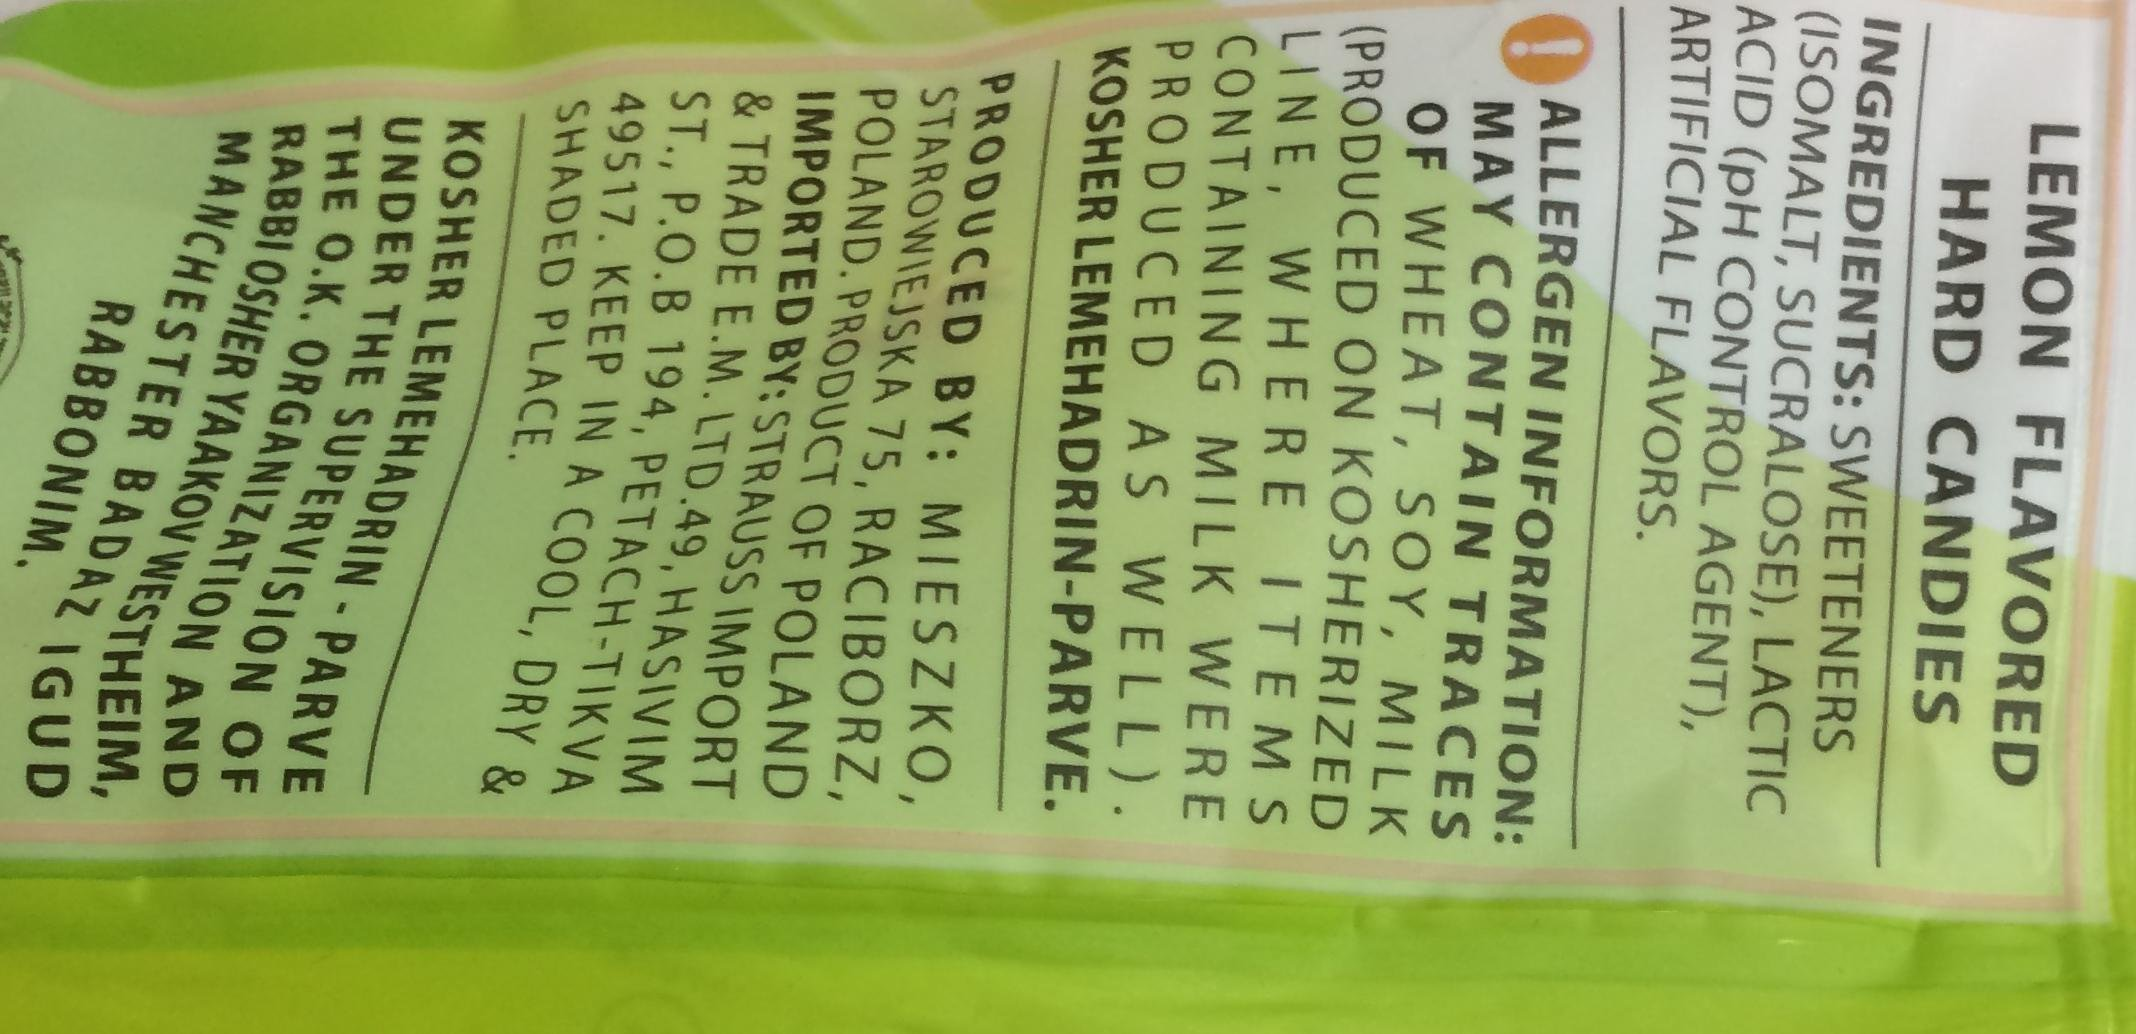 Elite Must Sugar Free Reduced Calorie Lemon Flavored 2.82 Oz. Pk Of 6.